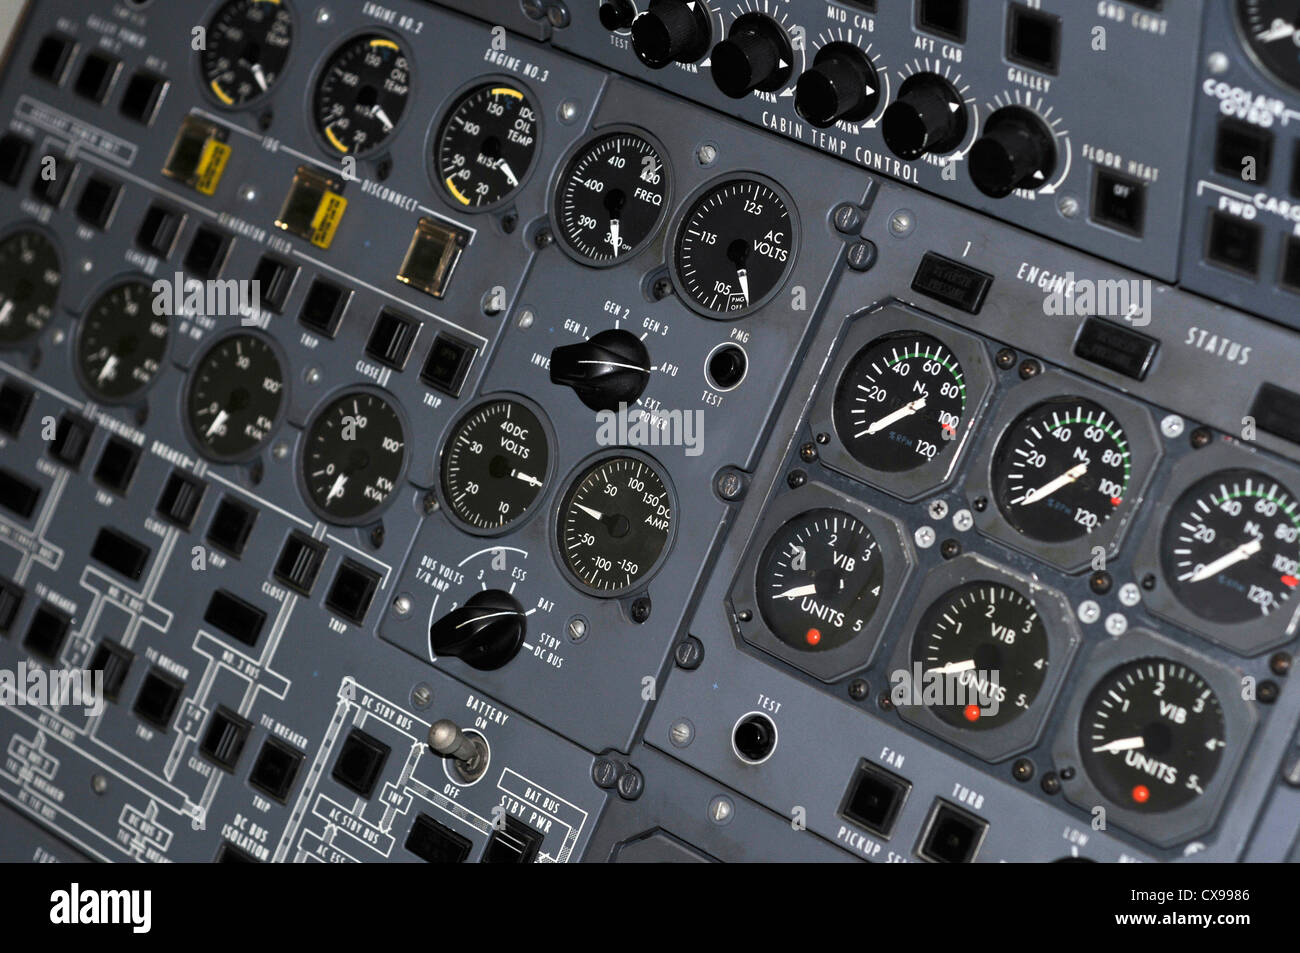 Aircraft flight deck. - Stock Image